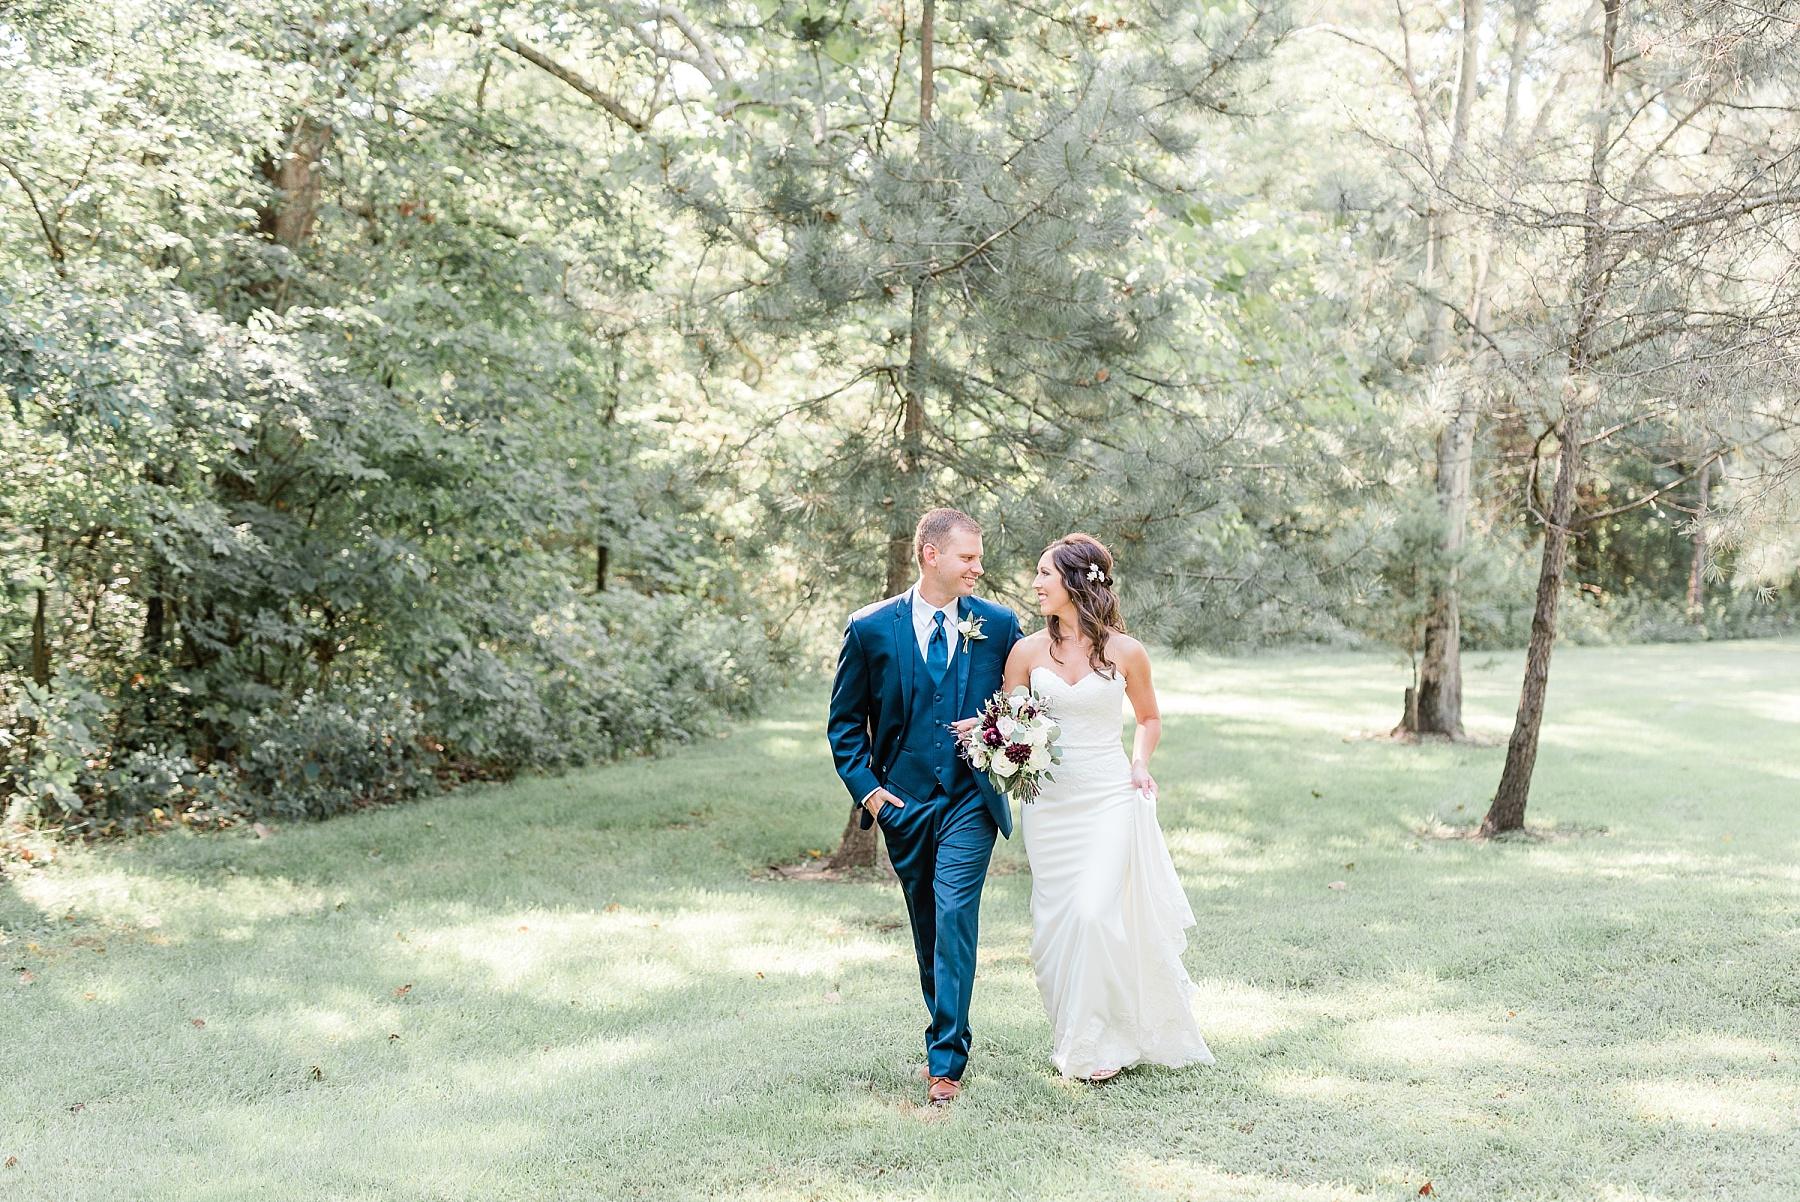 Romantic Summer Sunset Wedding Ceremony at Little Piney Lodge St. Louis Missouri by Kelsi Kliethermes Photography Fine Art Photographer_0005.jpg